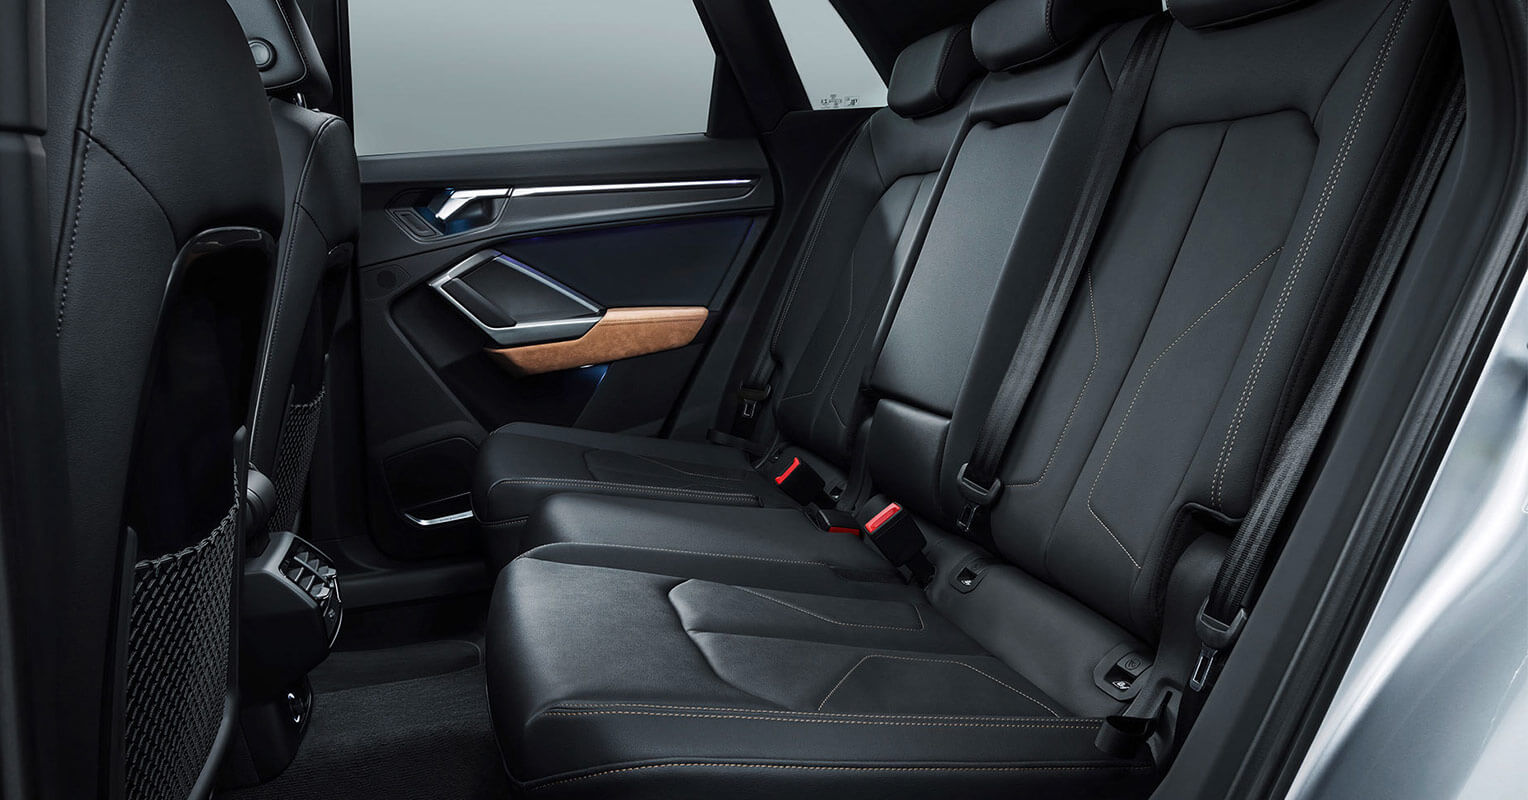 Plazas traseras del Audi Q3 2019